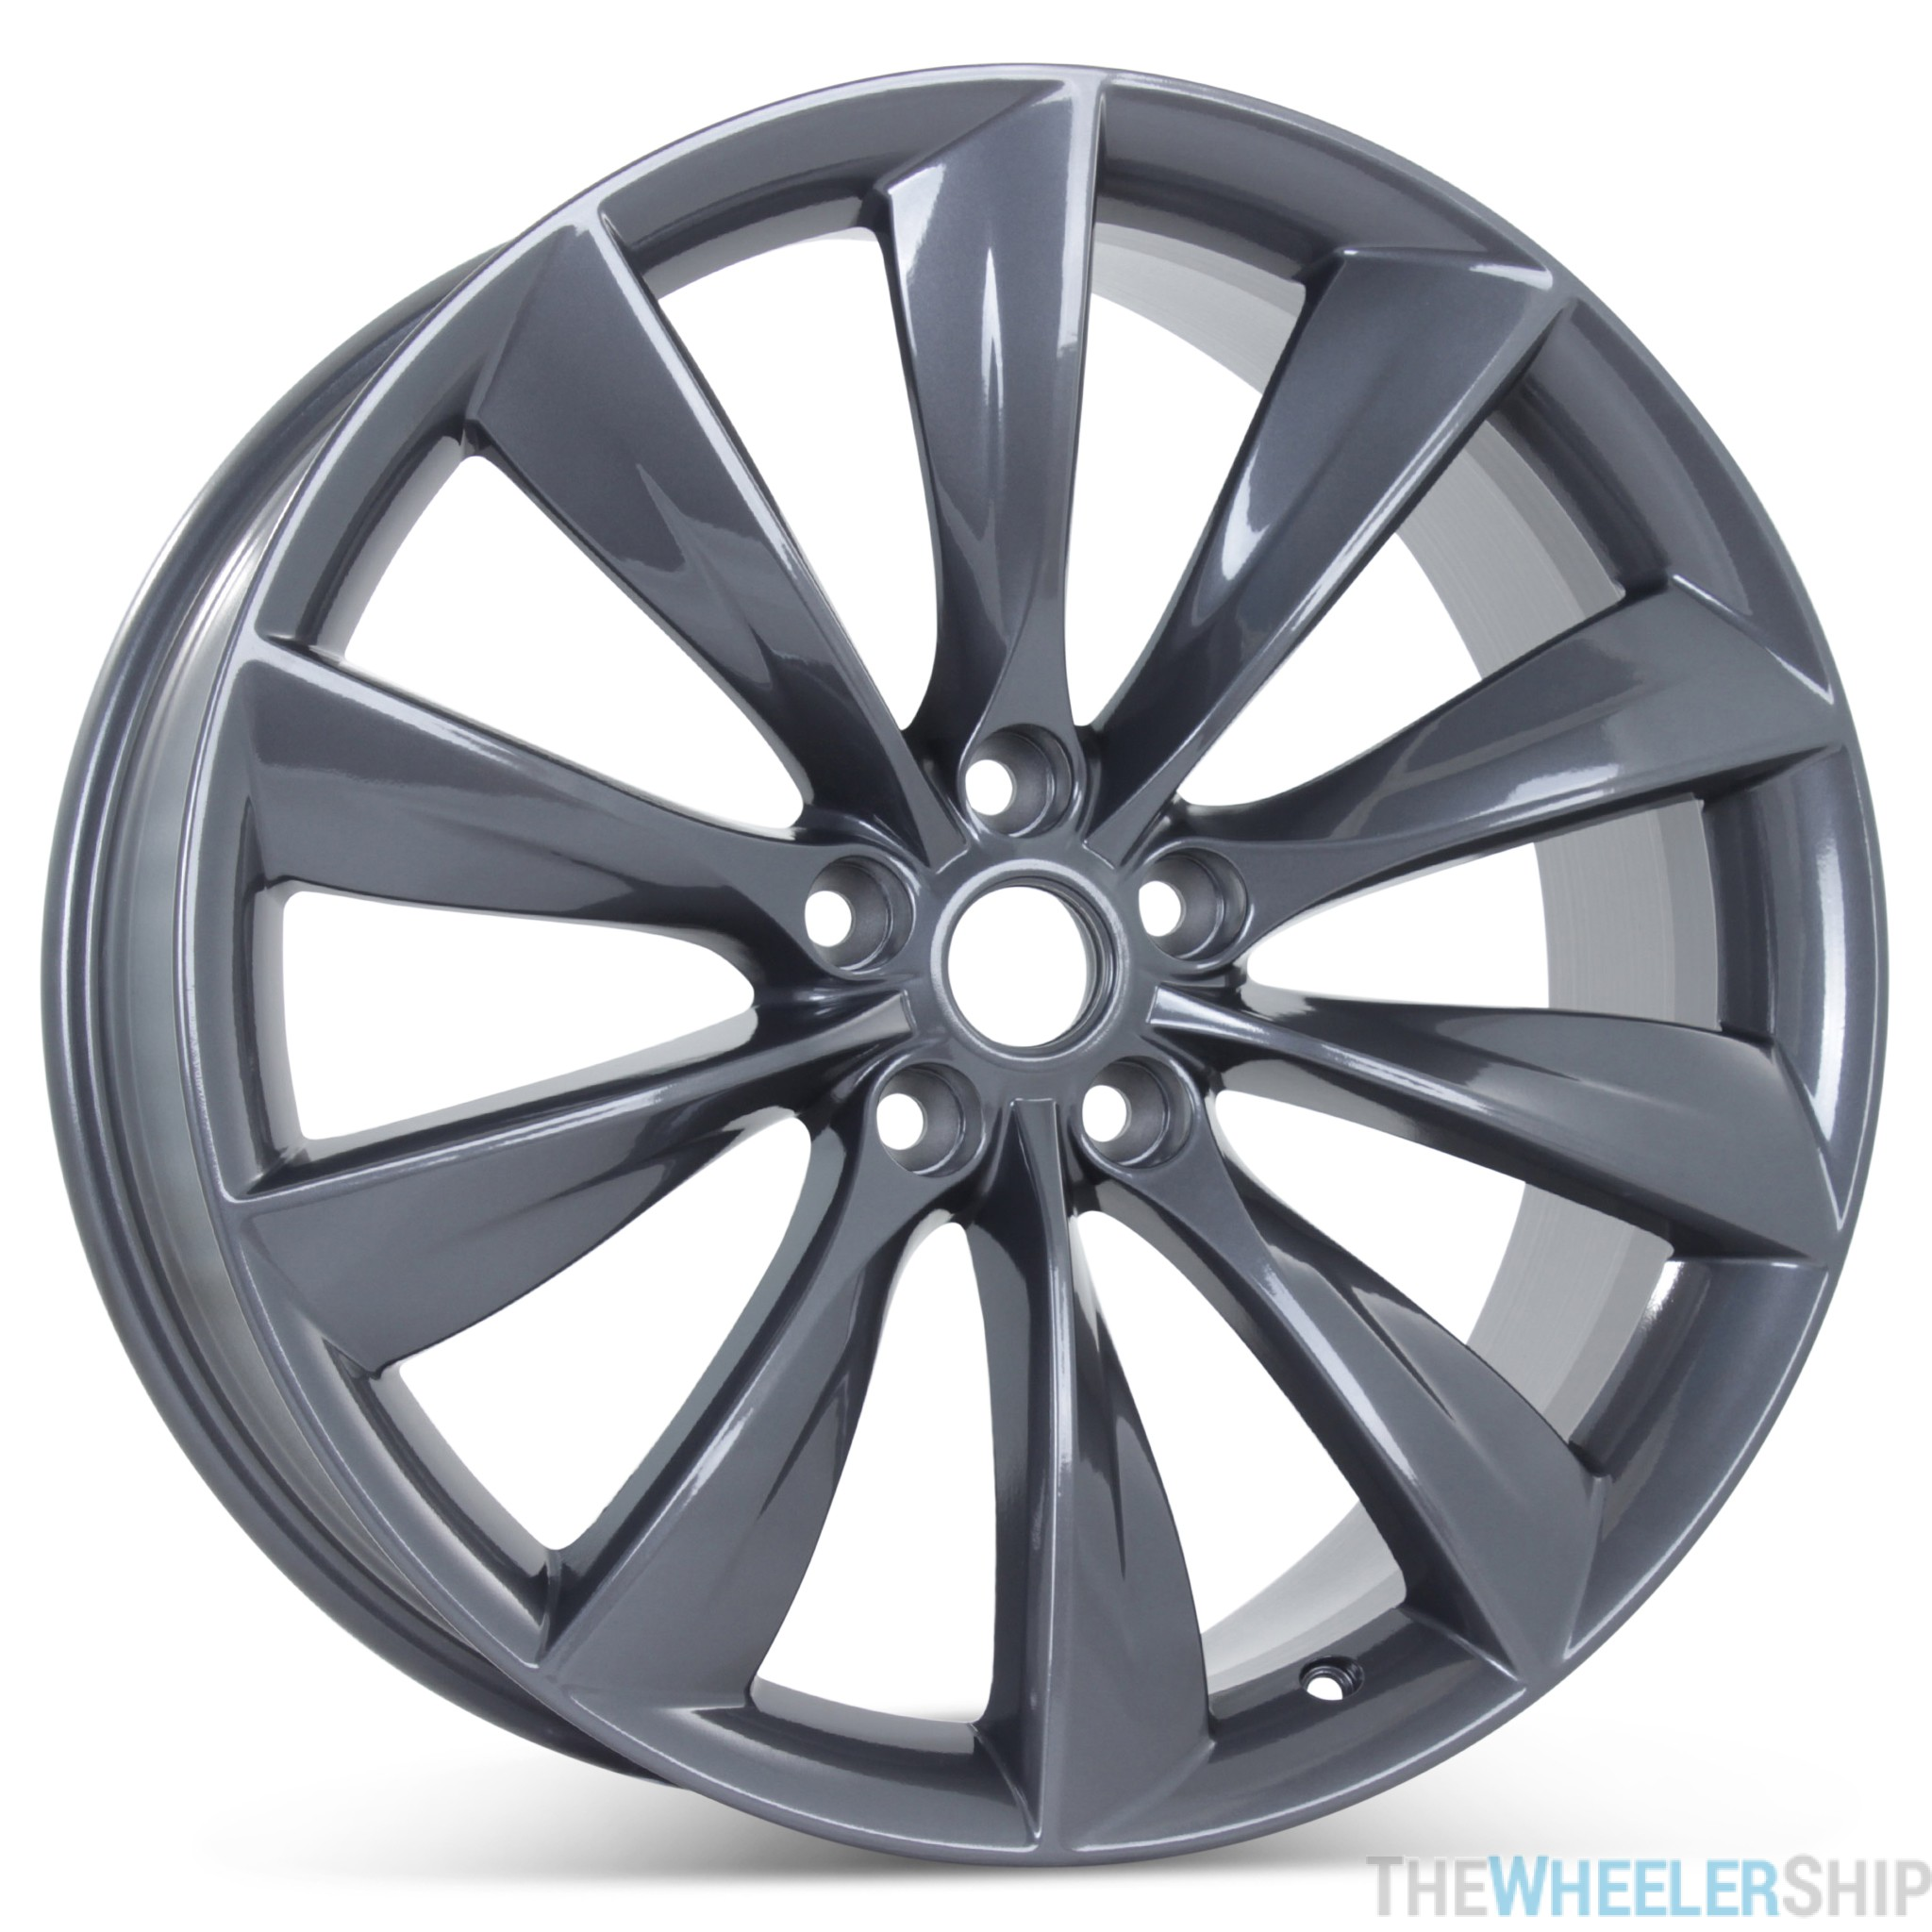 New 21 X 85 Front Wheel For Tesla Model S 2012 2013 2014 2015 2016 2017 Gray Rim 98727